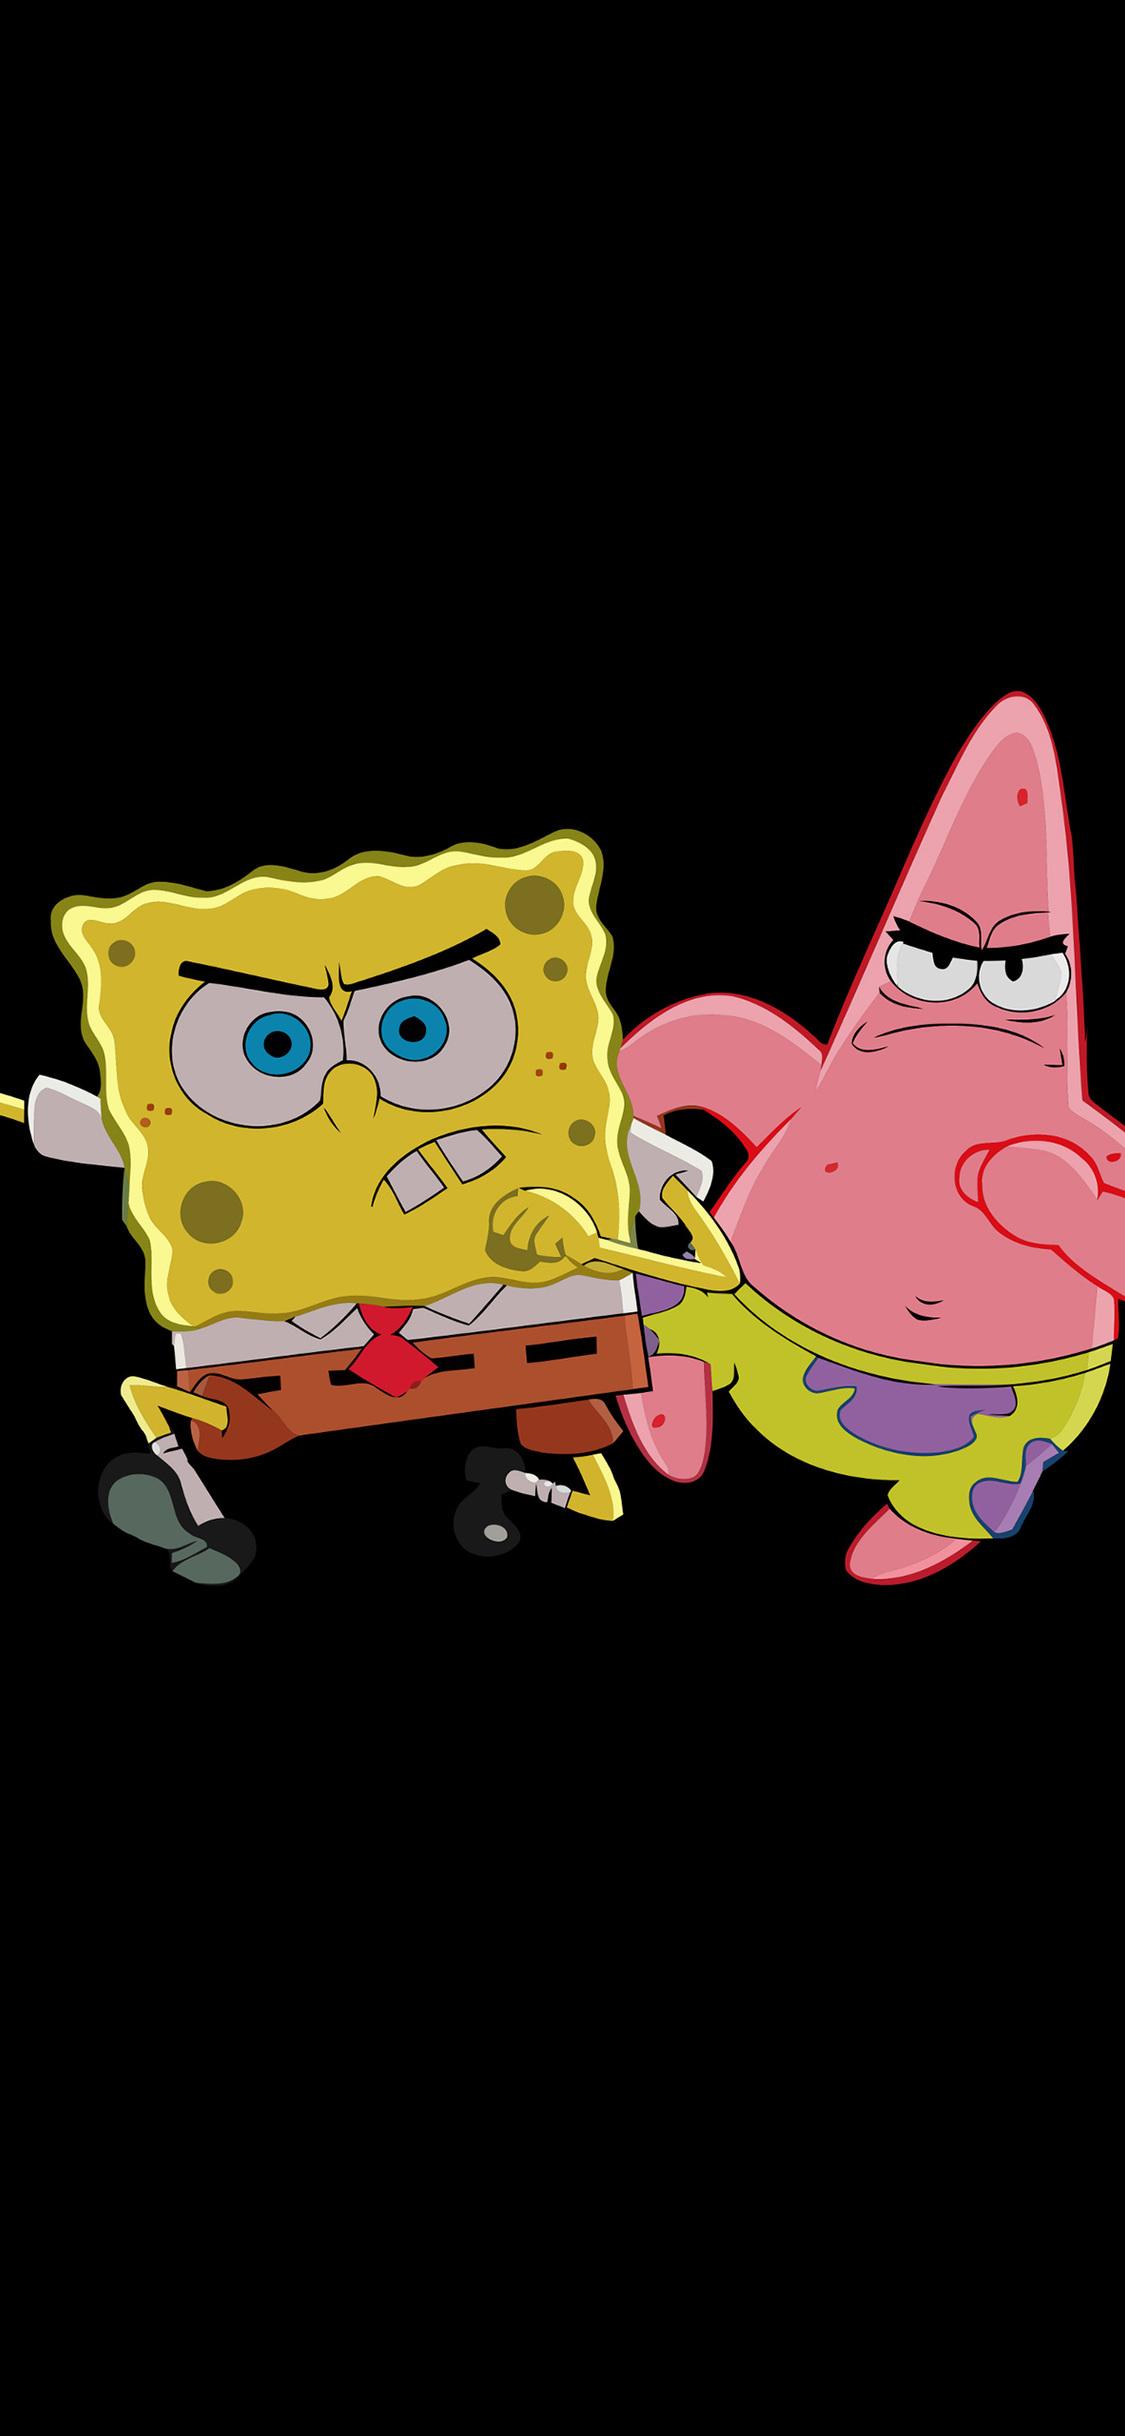 Patrick Star And Spongebob Spongebob Wallpaper Iphone X